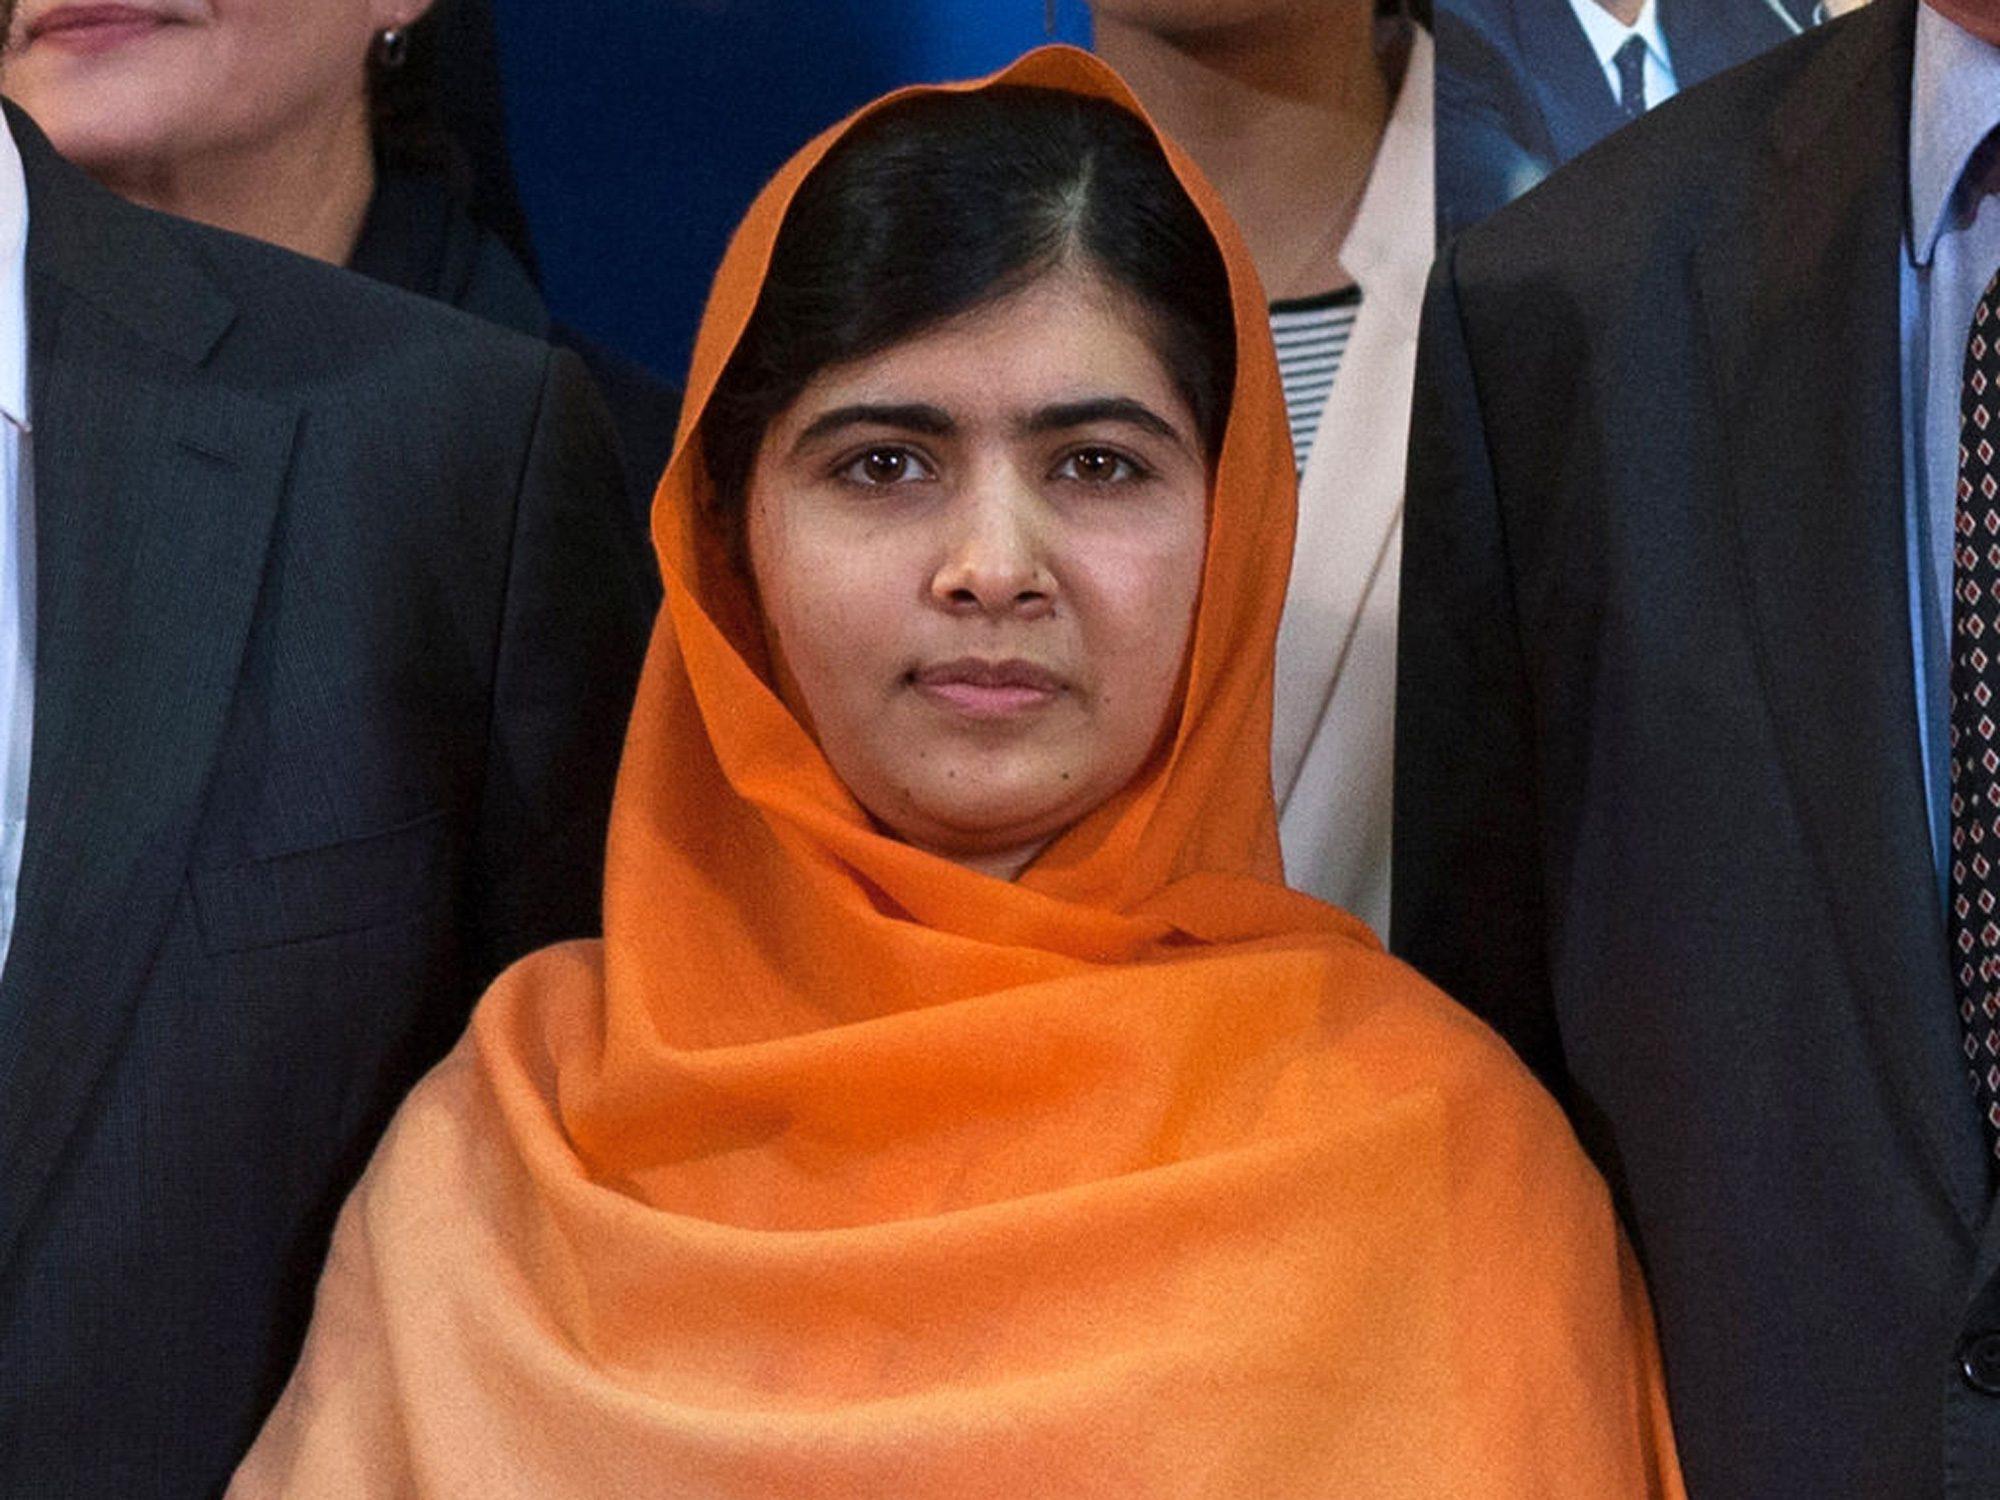 The Power of One: Nobel Peace Prize Winner Malala Yousafzai